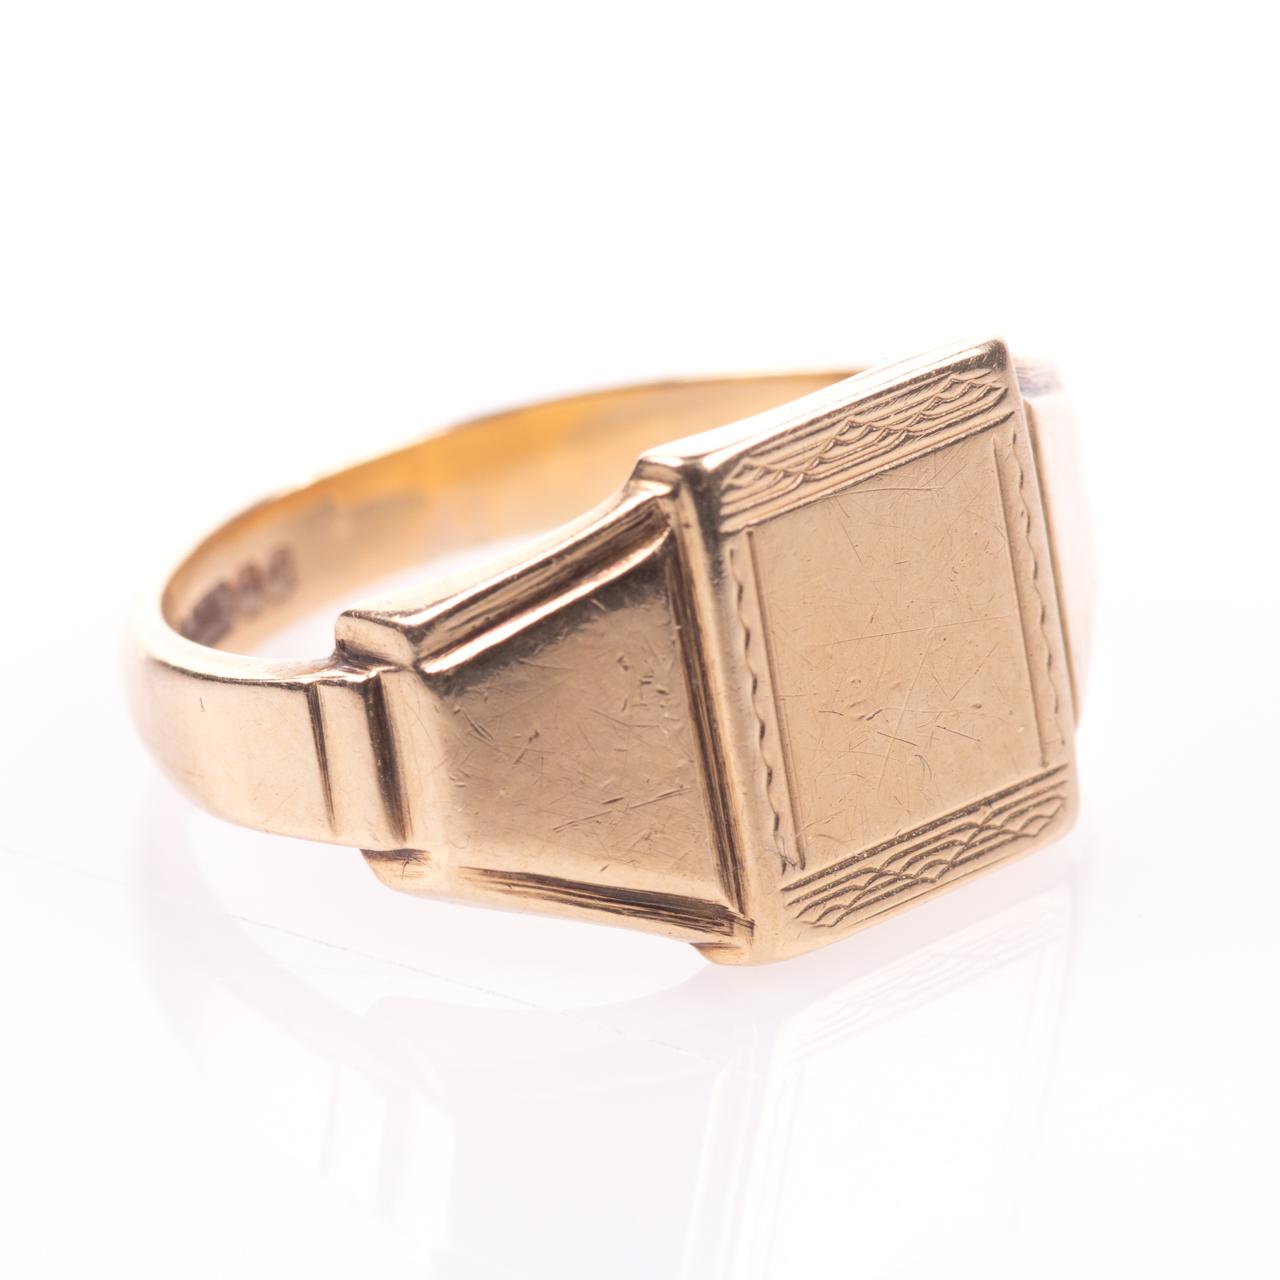 Art Deco Style Gentleman's Signet Ring 9ct Gold - Image 7 of 7